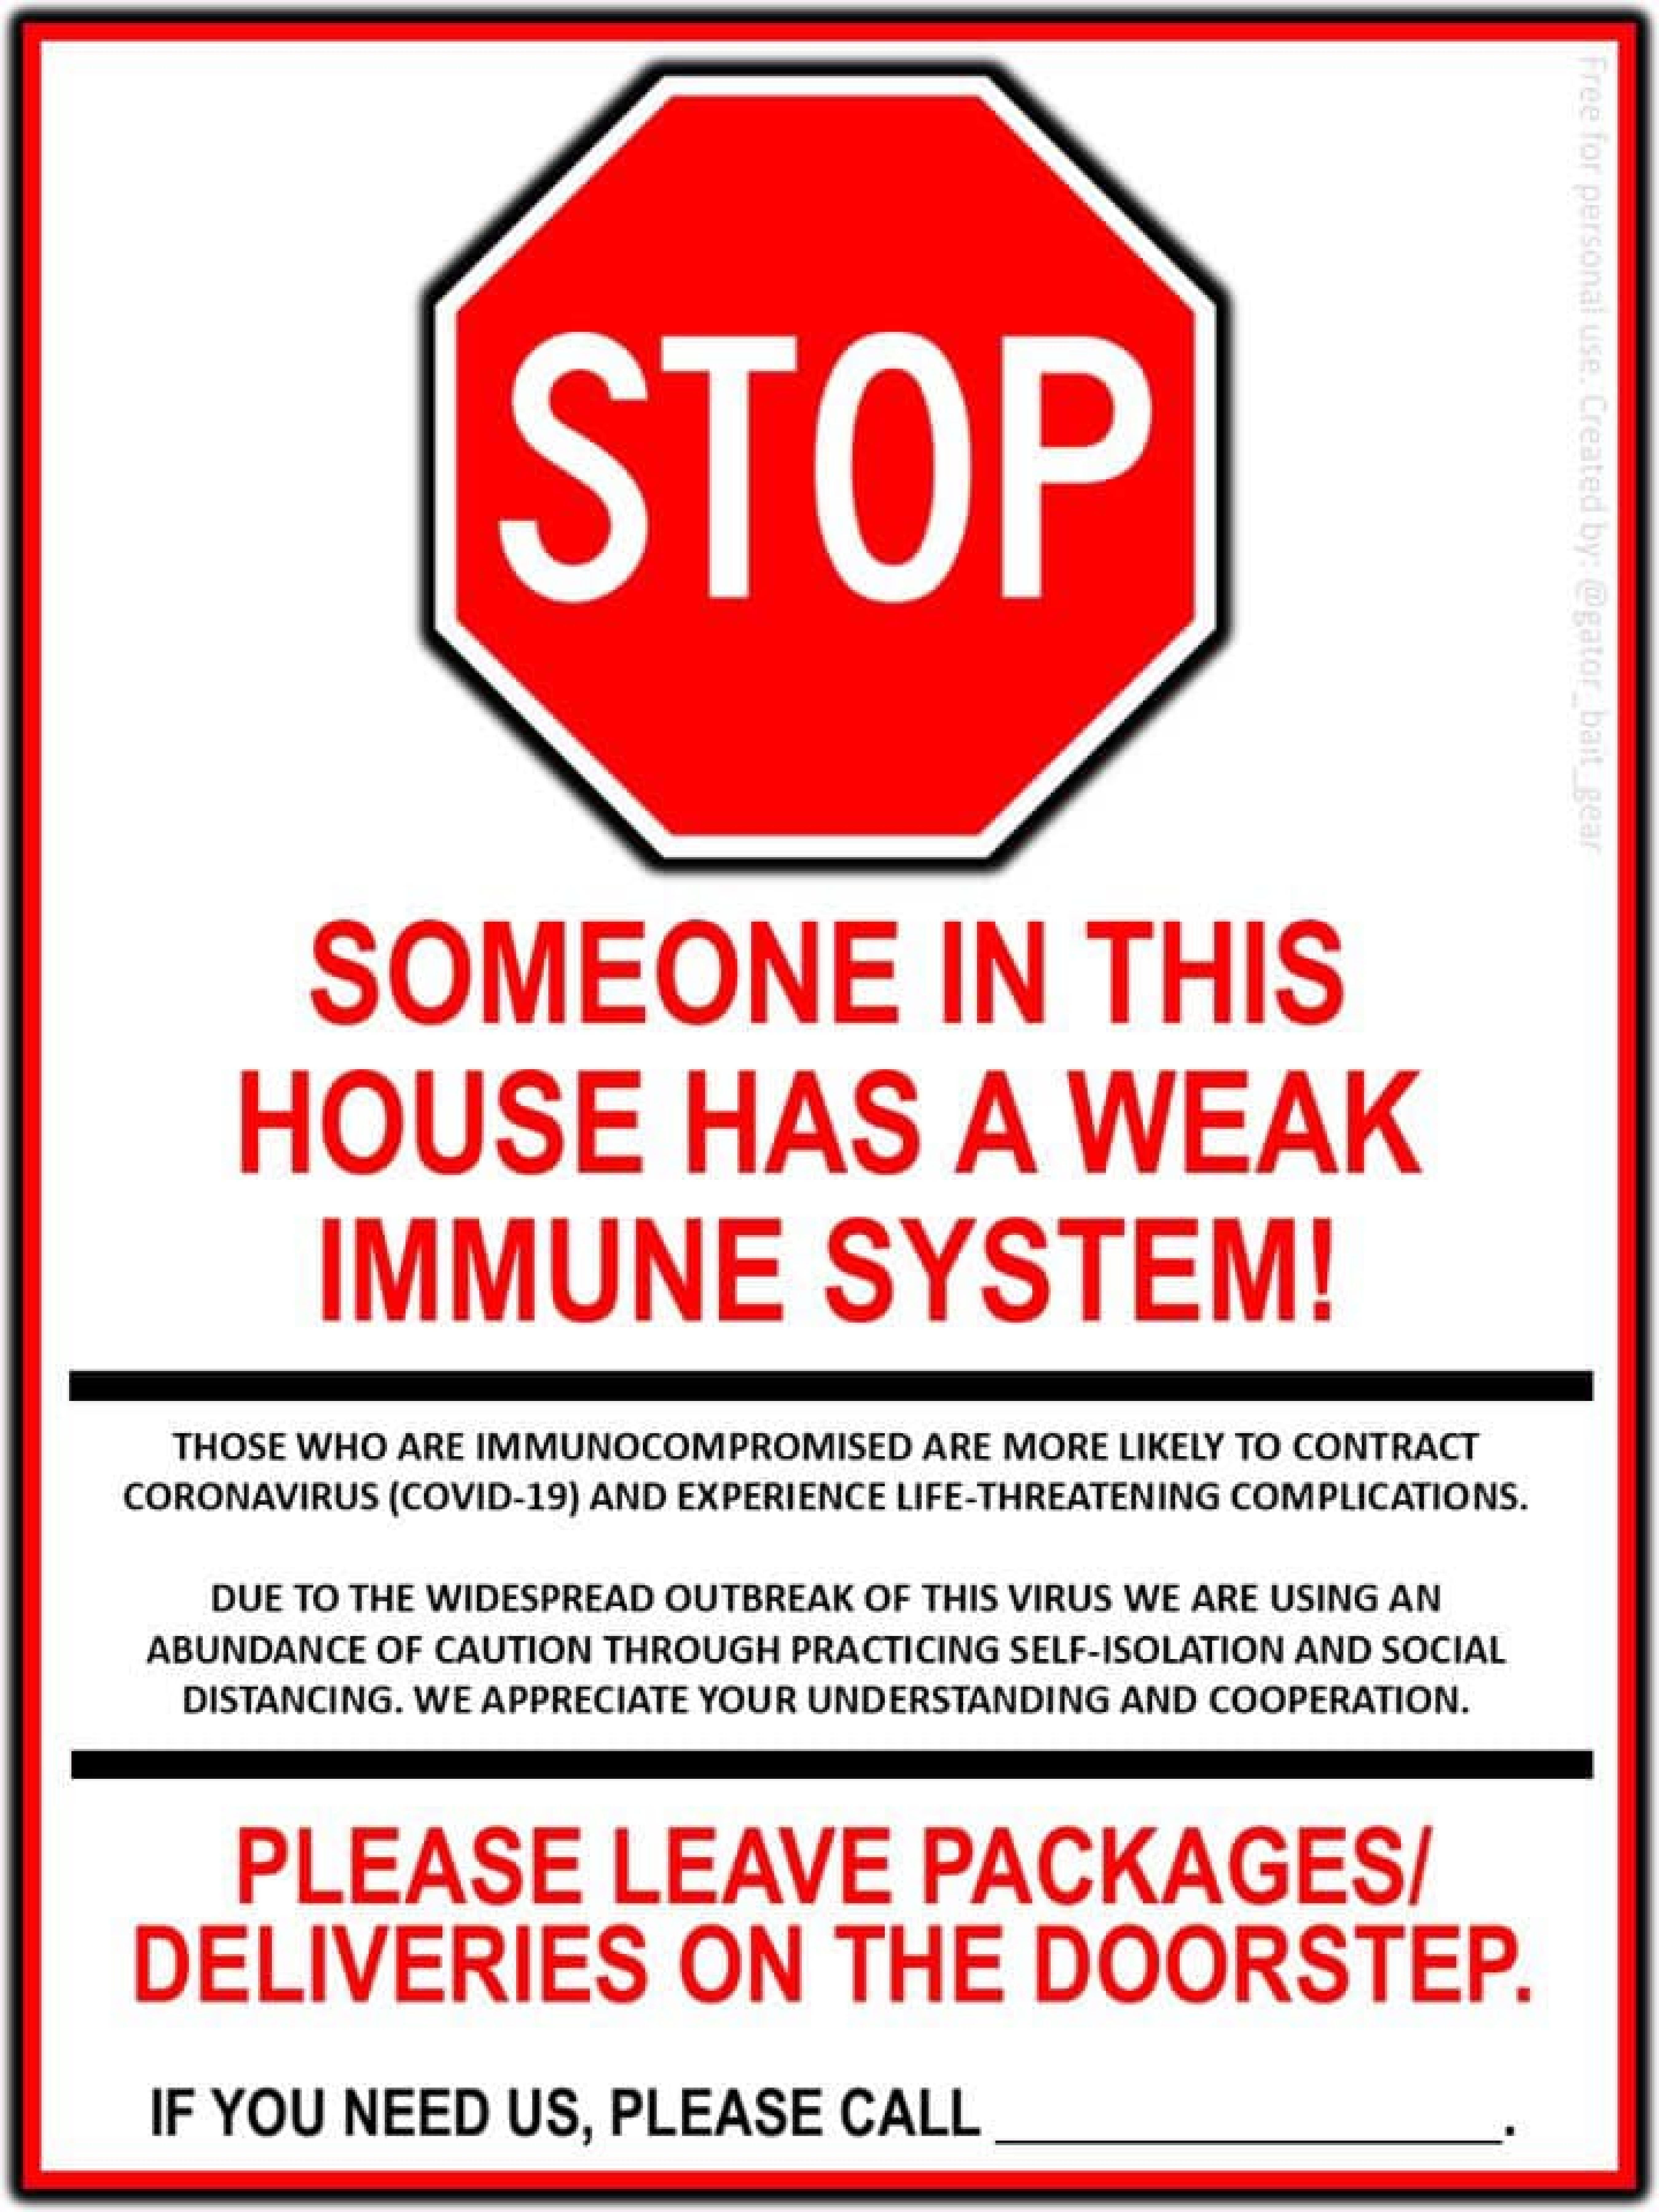 Stop weak immune system leave at door poster - HOME